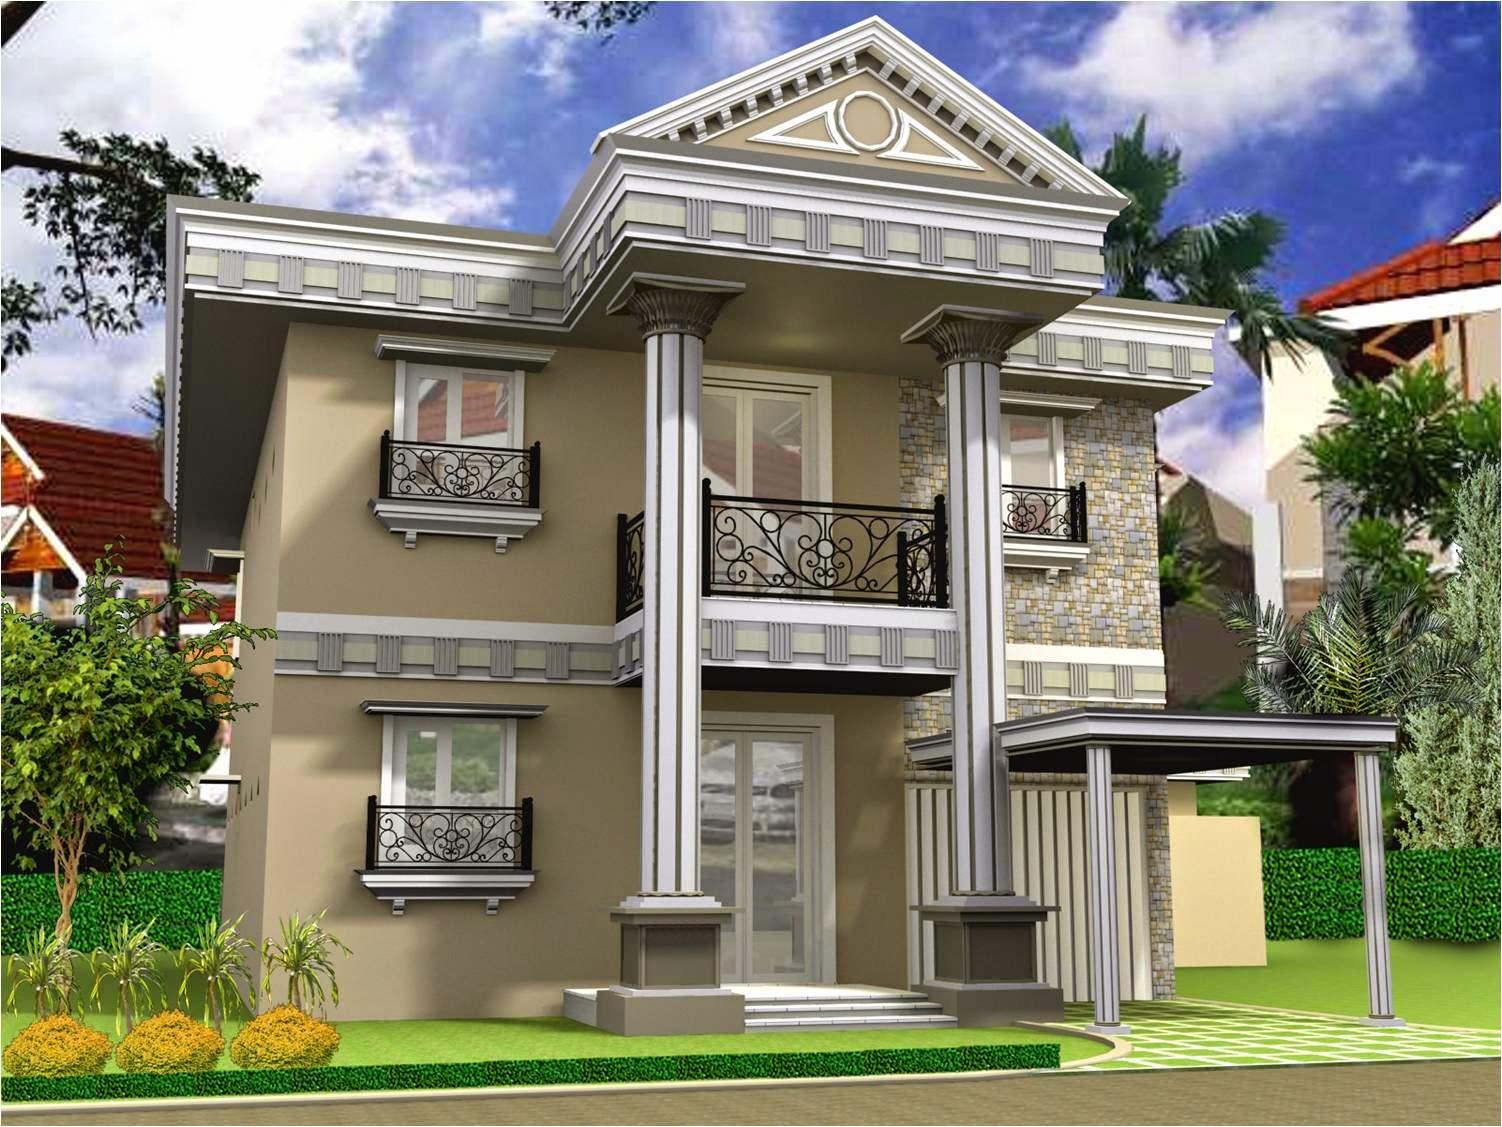 Home Improvement Design Luxury Home Design Minimalist Latest Nd Home  Improvement Design Luxury Home Design Minimalist